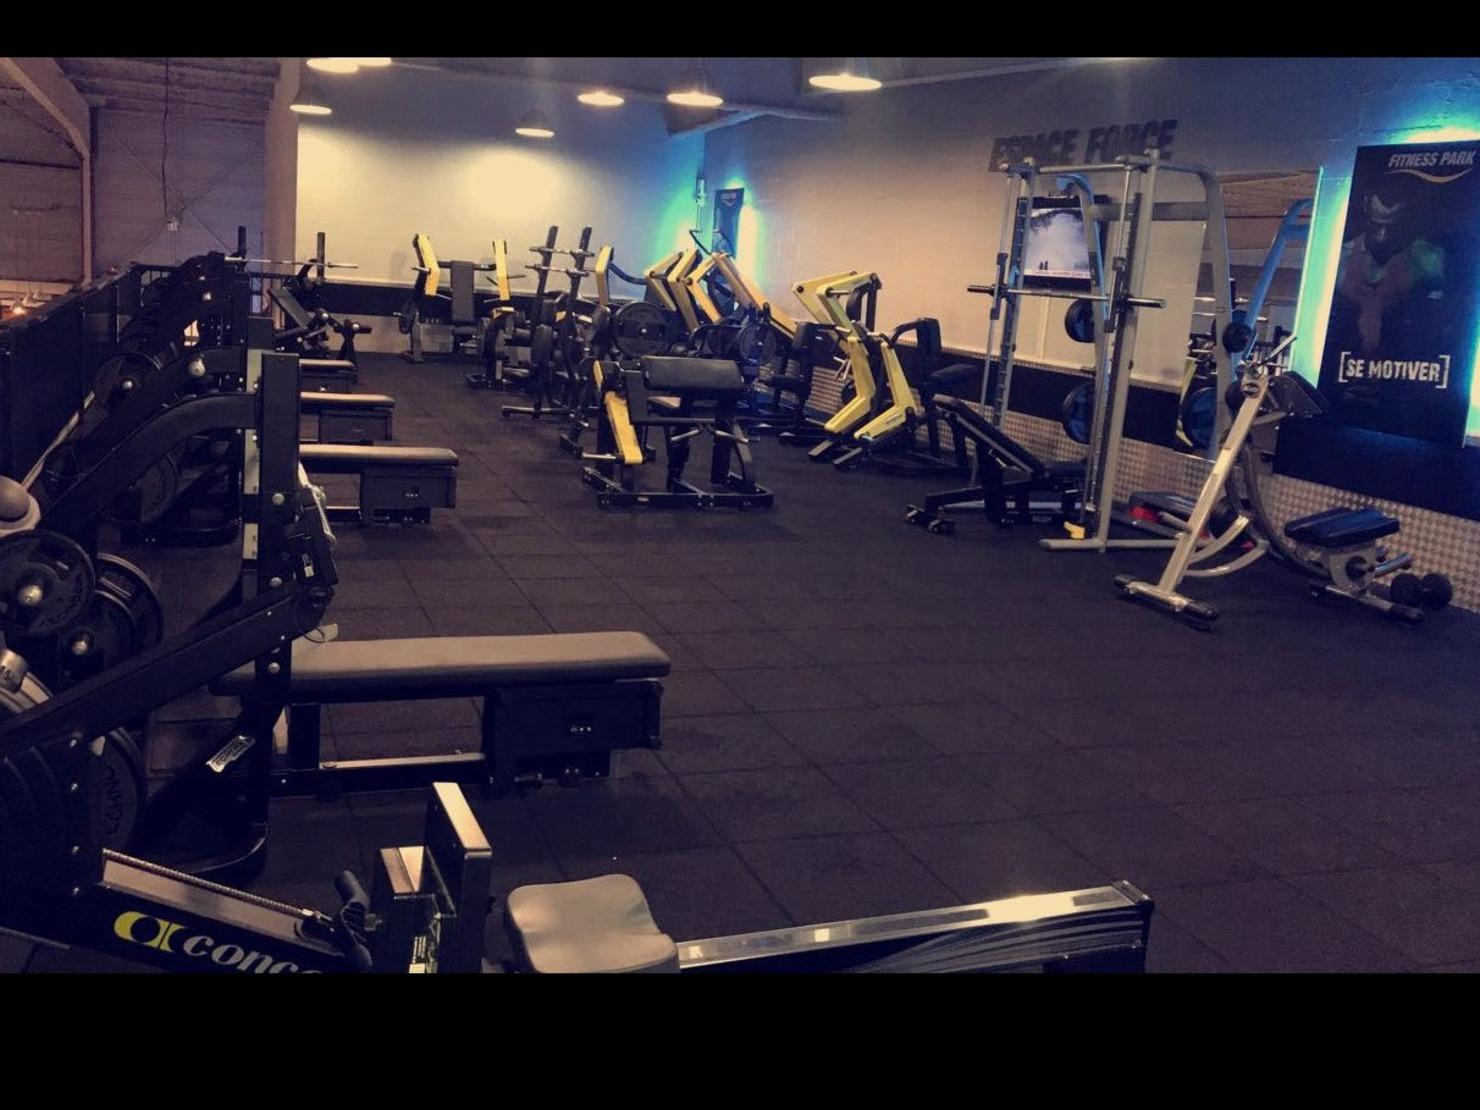 Fitness Park Roissy En Brie A Roissy En Brie Tarifs Avis